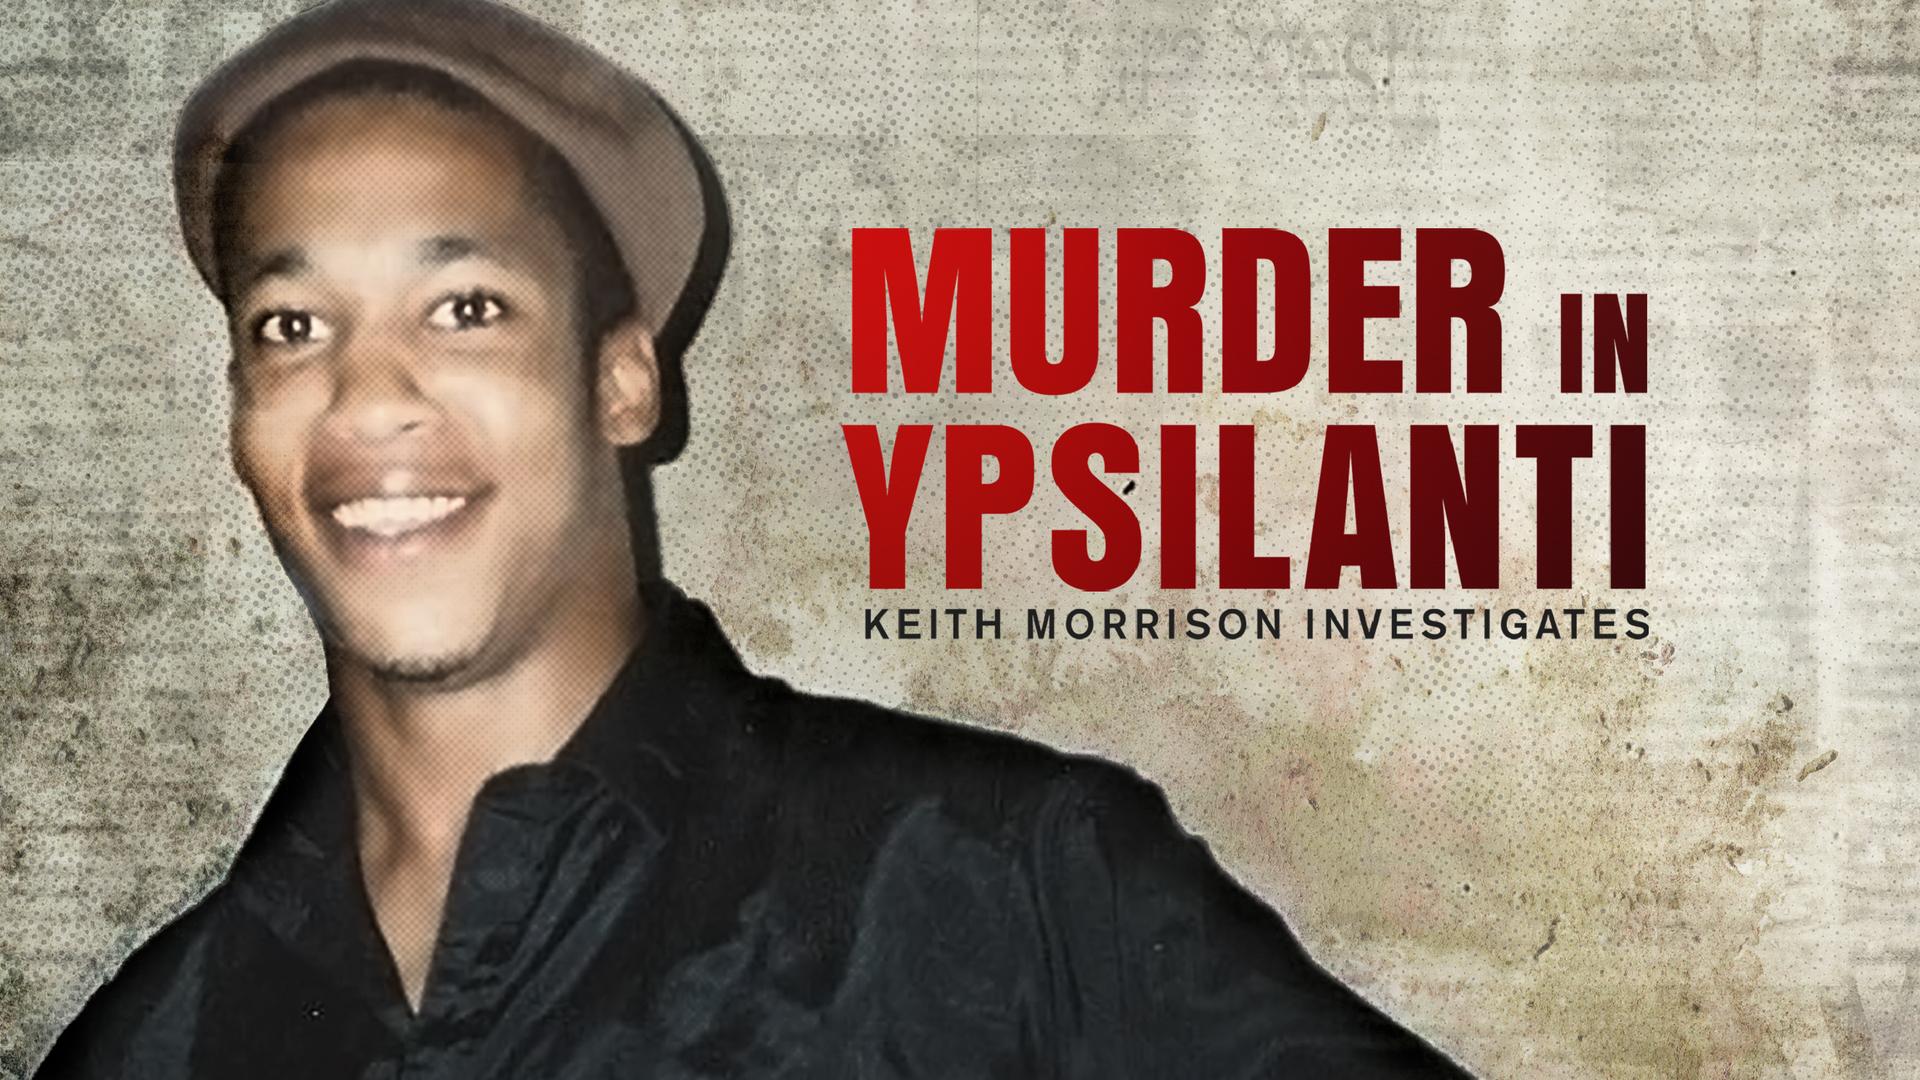 Murder in Ypsilanti: Keith Morrison Investigates (at) - Season 1